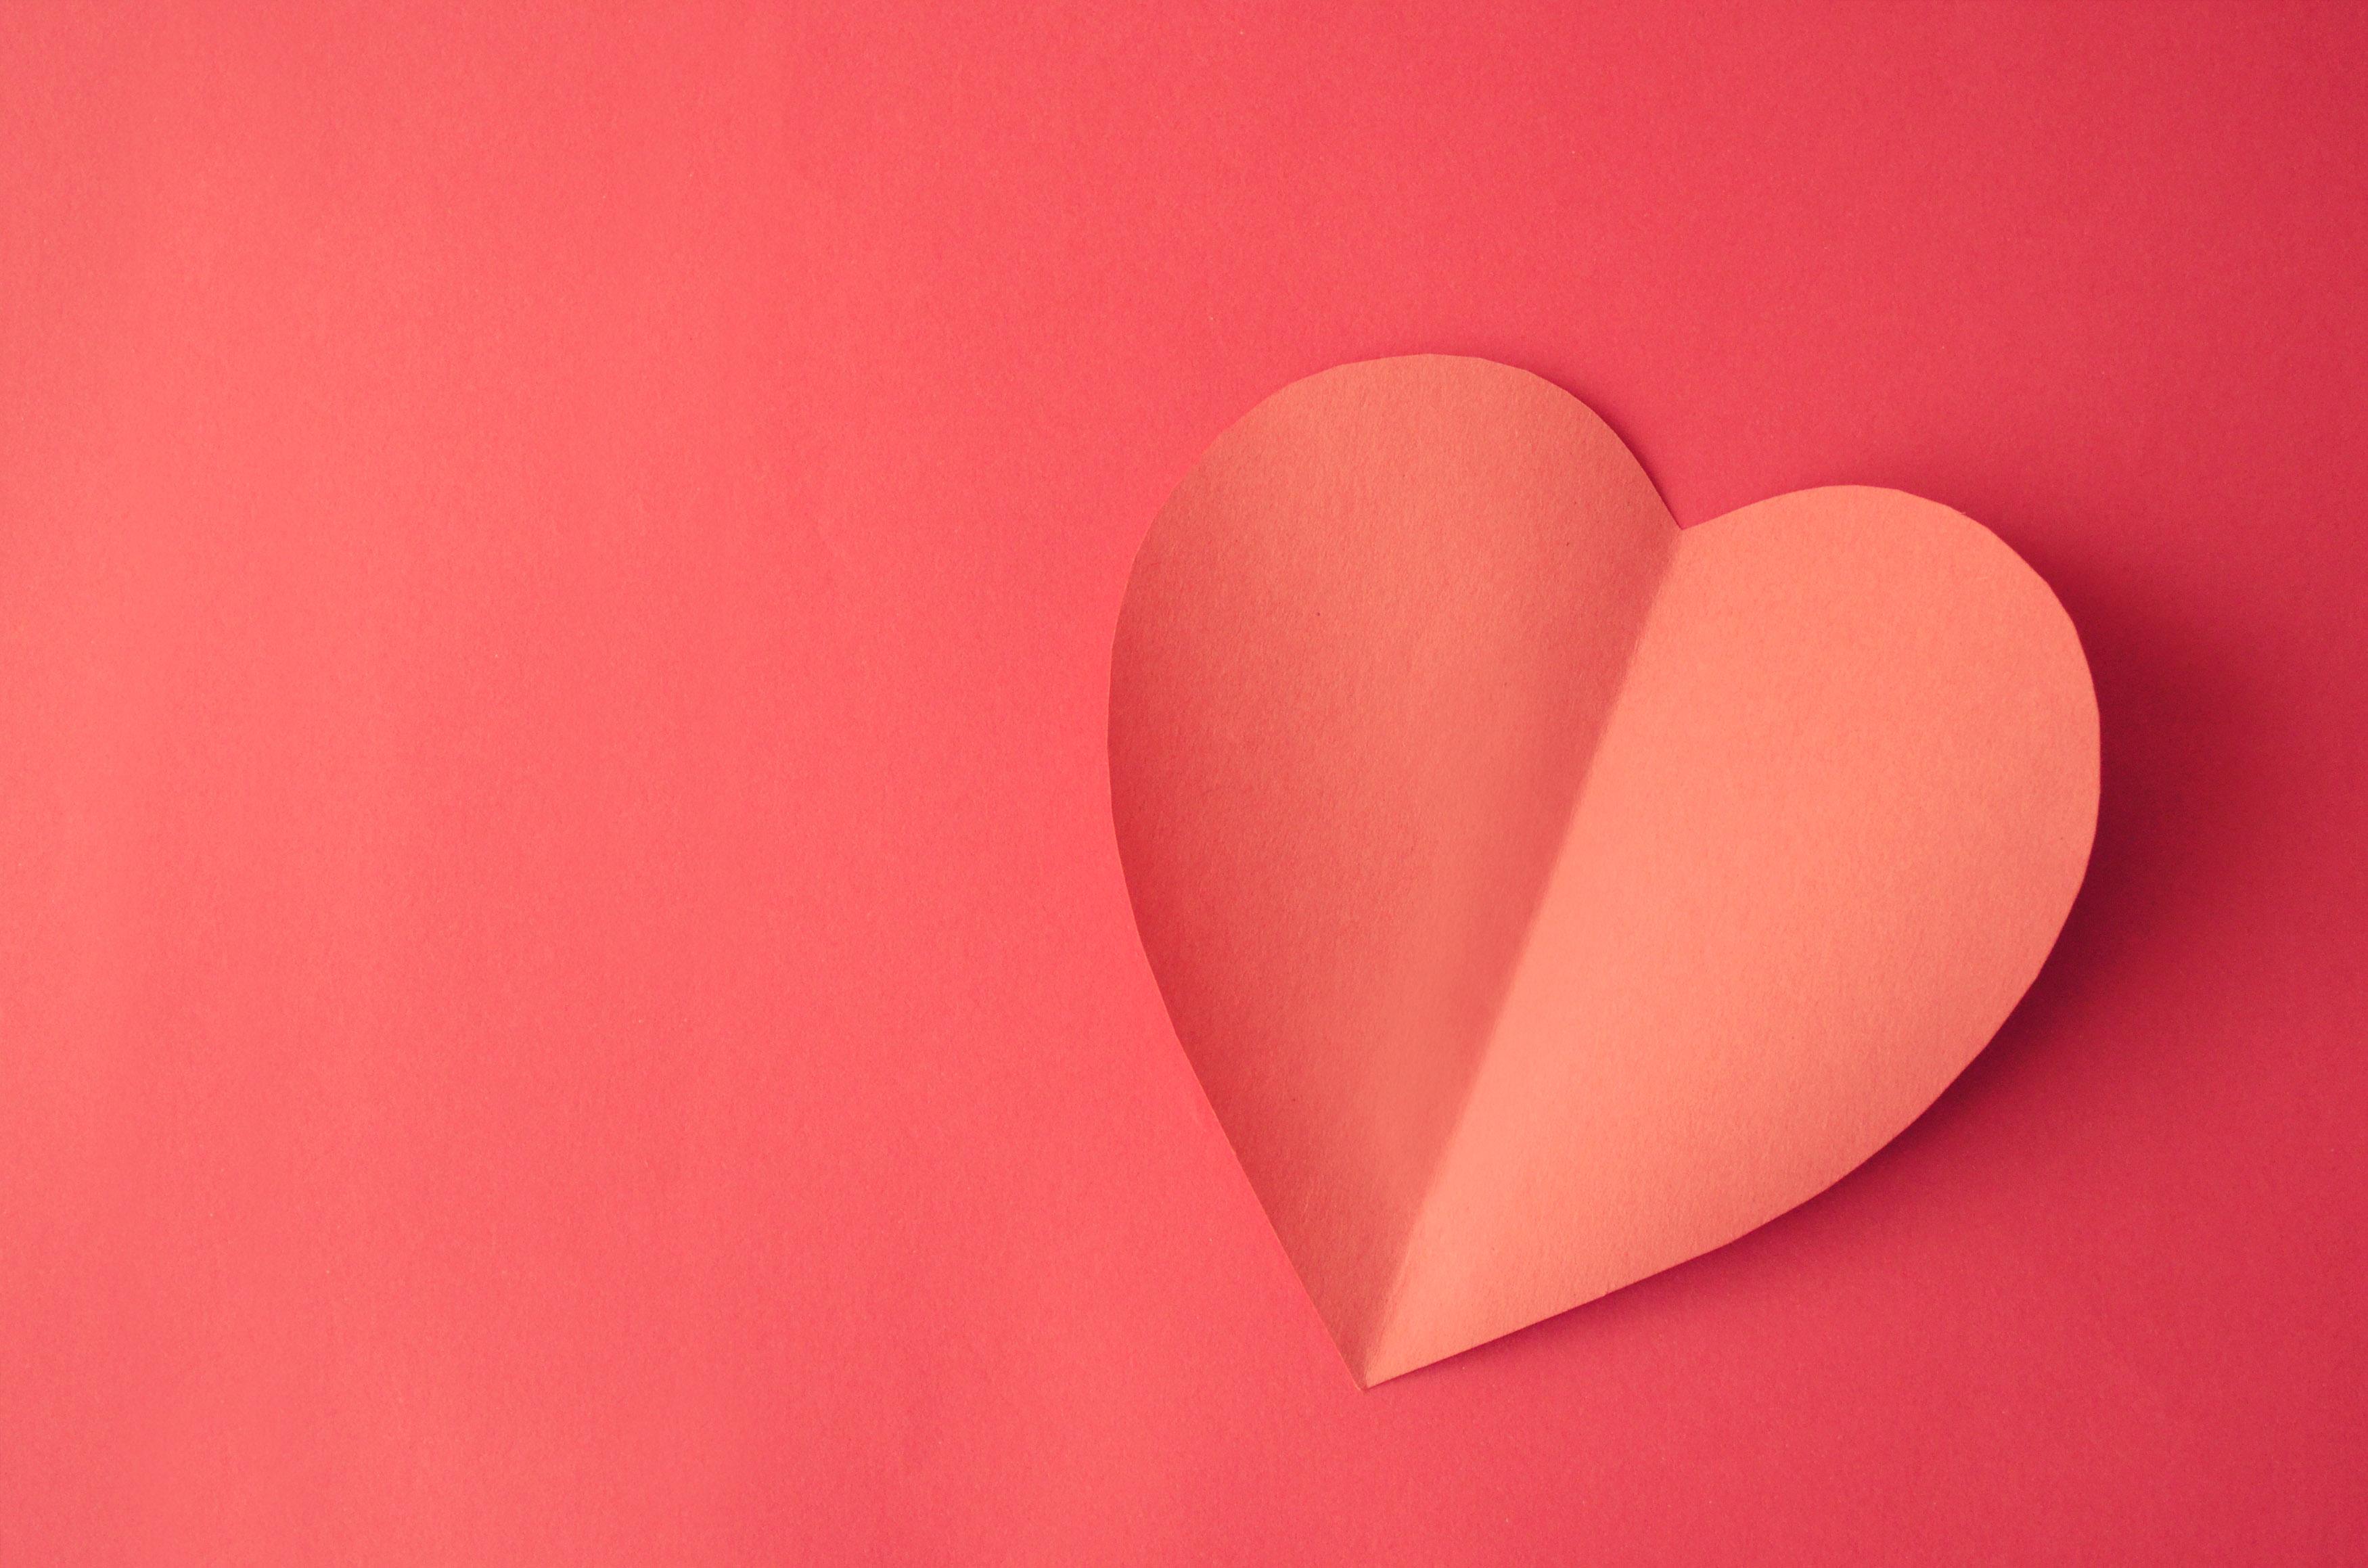 love miłość